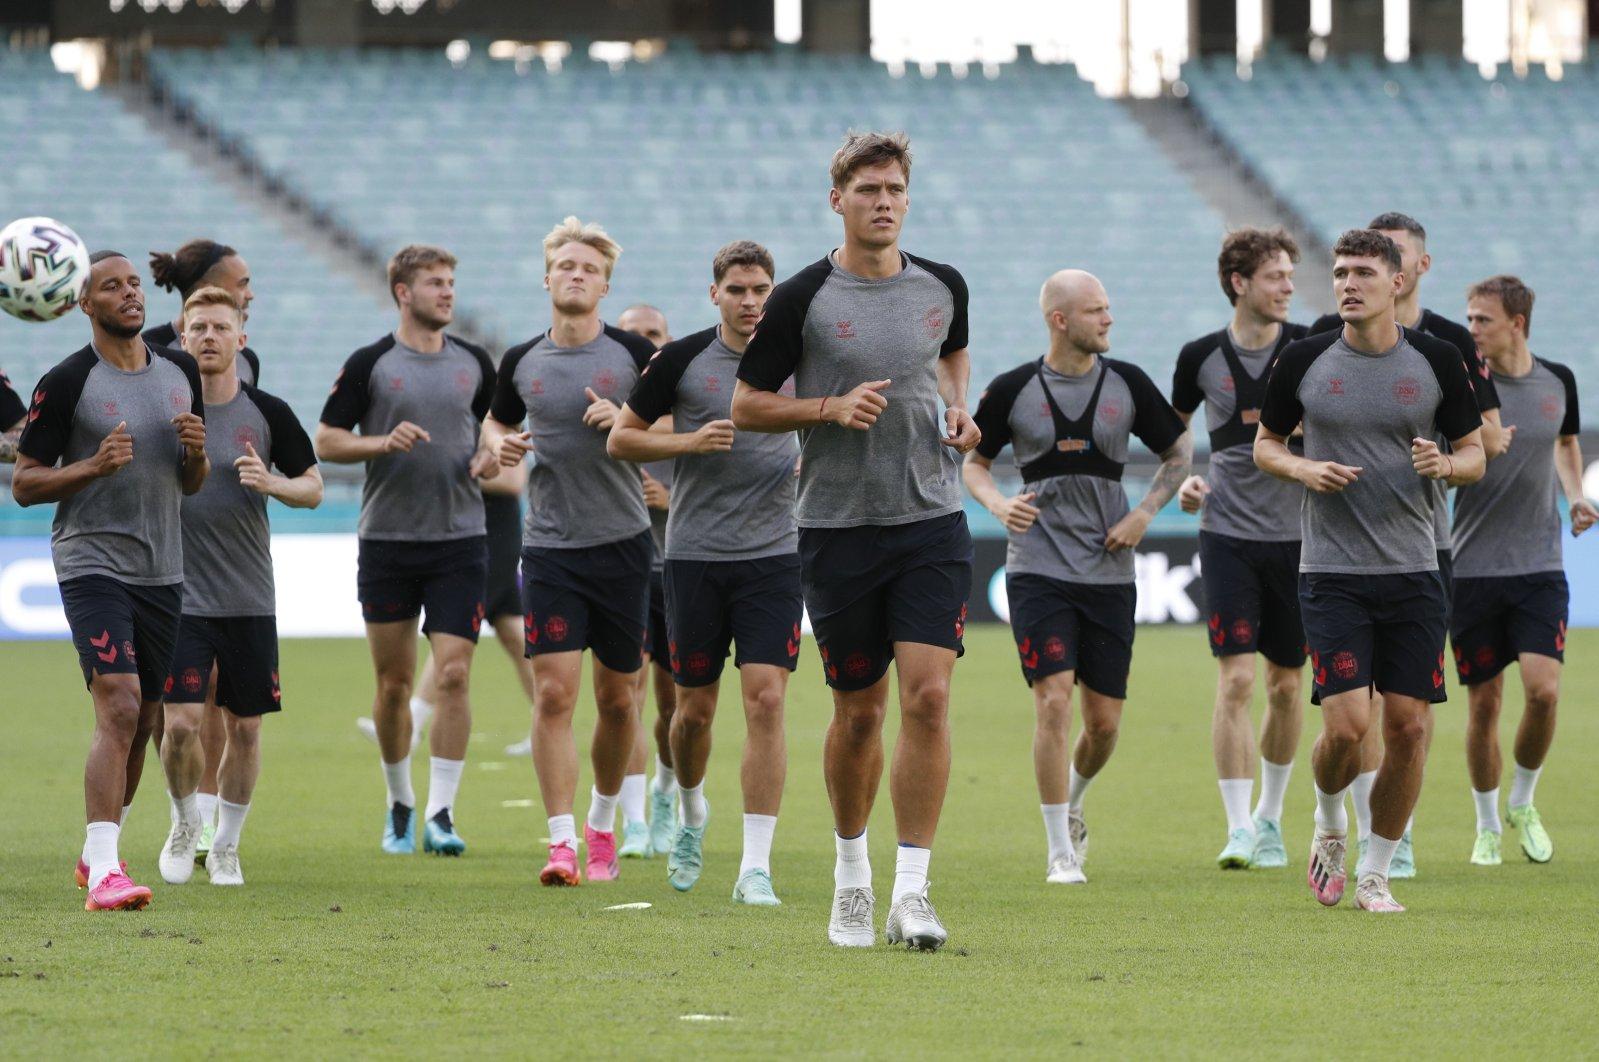 Denmark players attend a training session at Baku Olympic Stadium, Baku, Azerbaijan, July 2, 2021. (Reuters Photo)